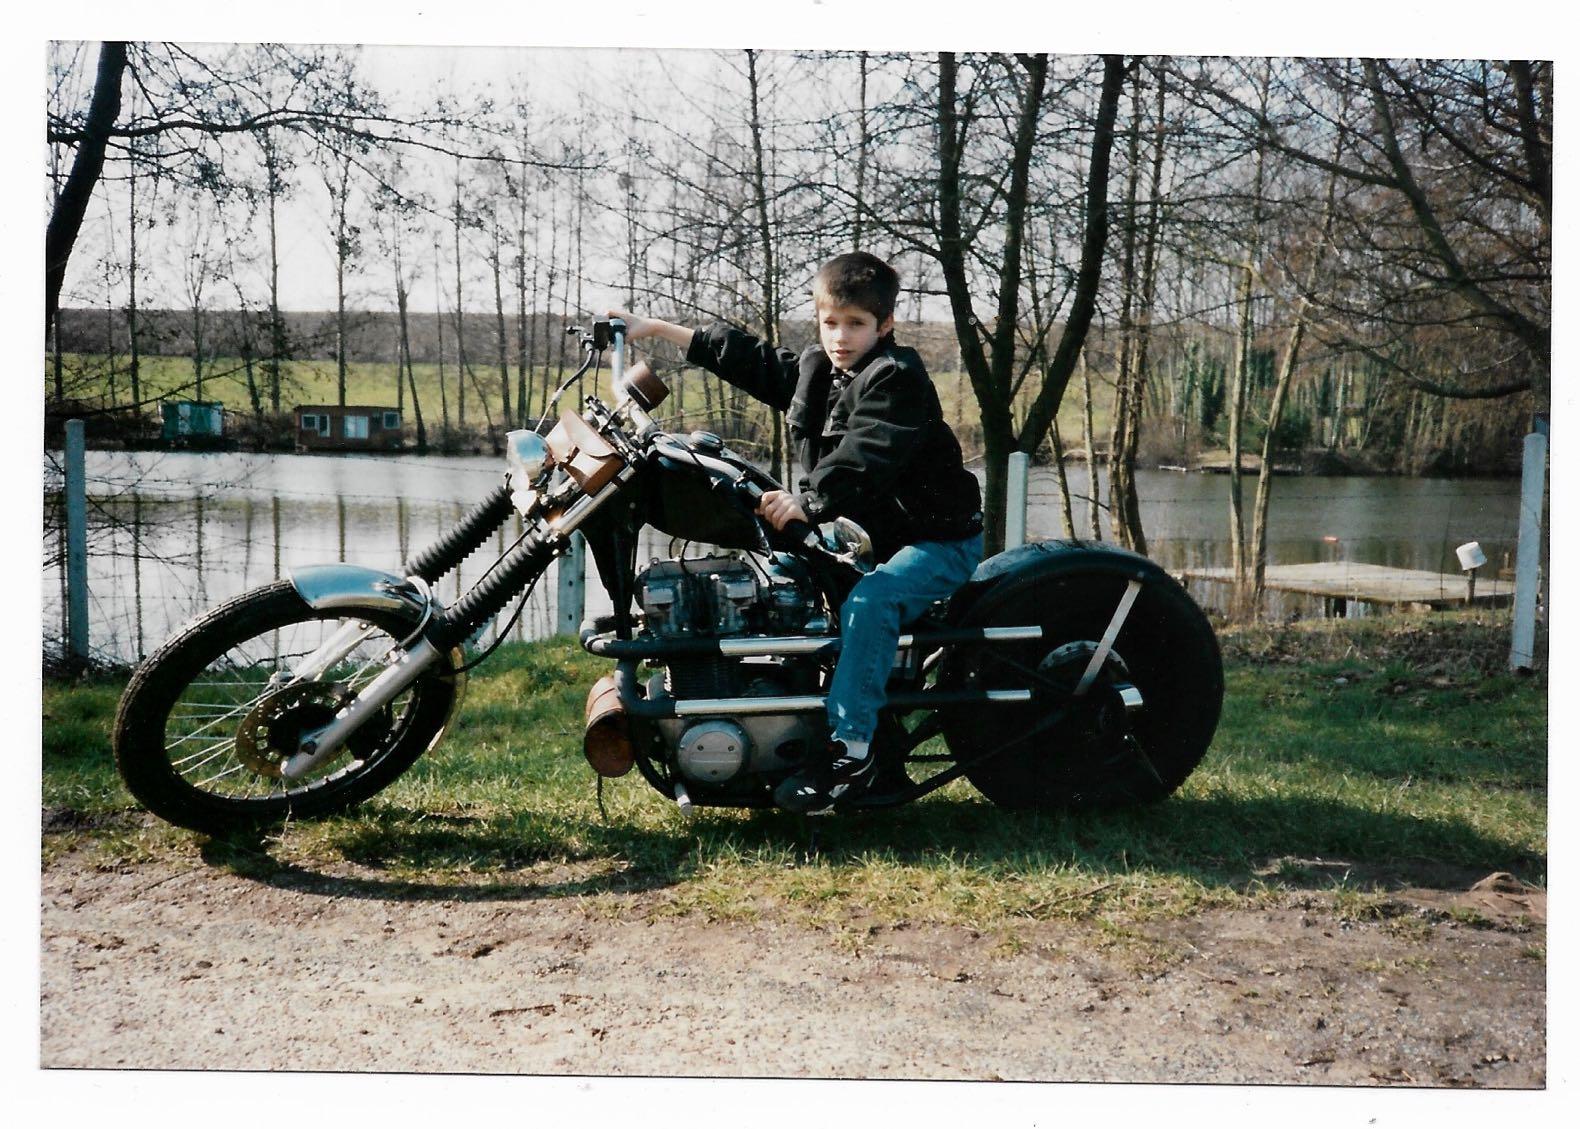 stylé année 90 jean levis harley davidson chopper